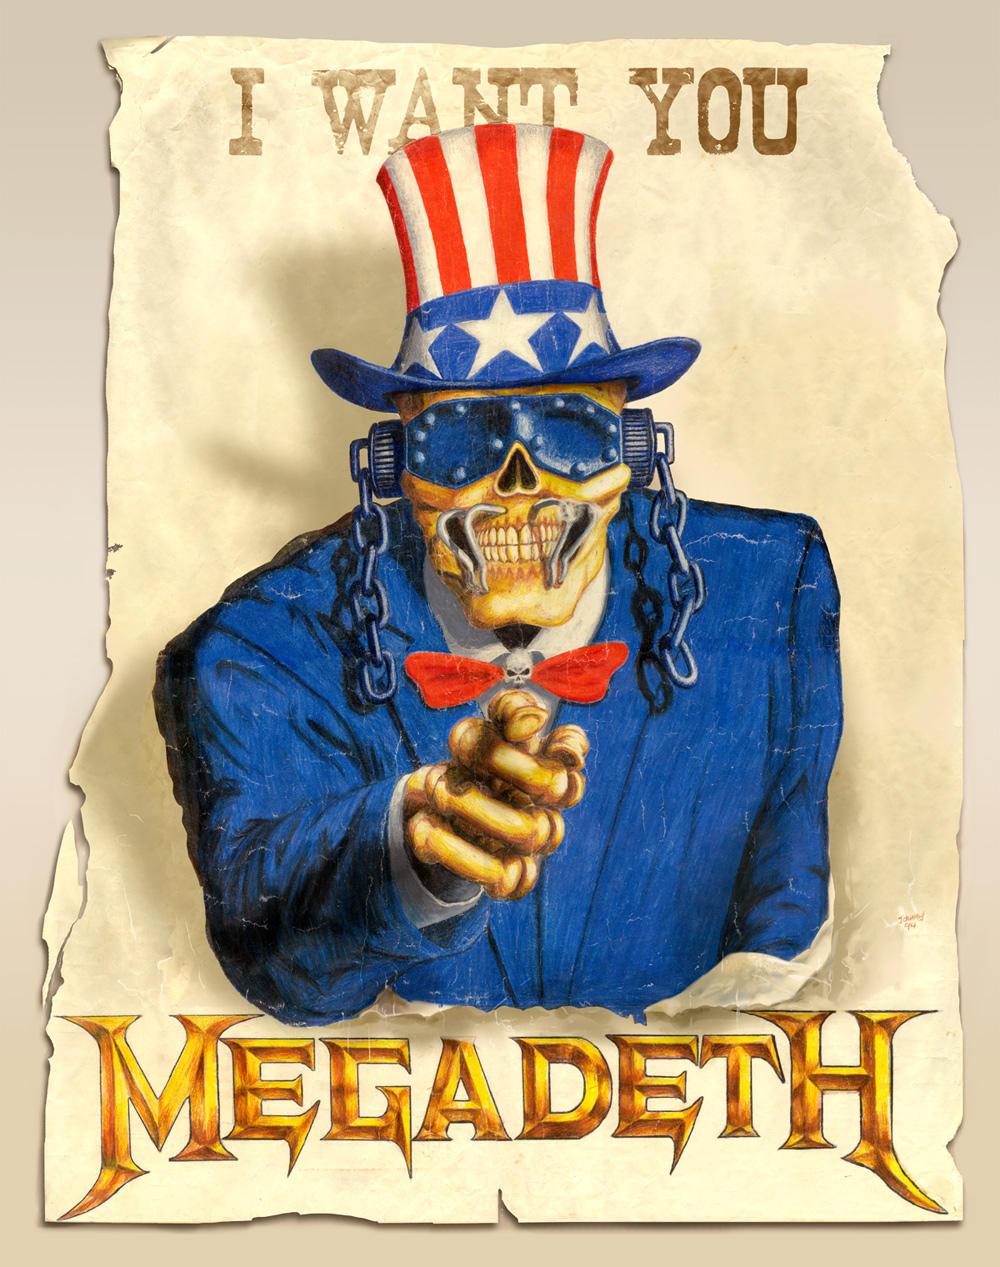 megadeth-countdown-to-extinction-wallpaper